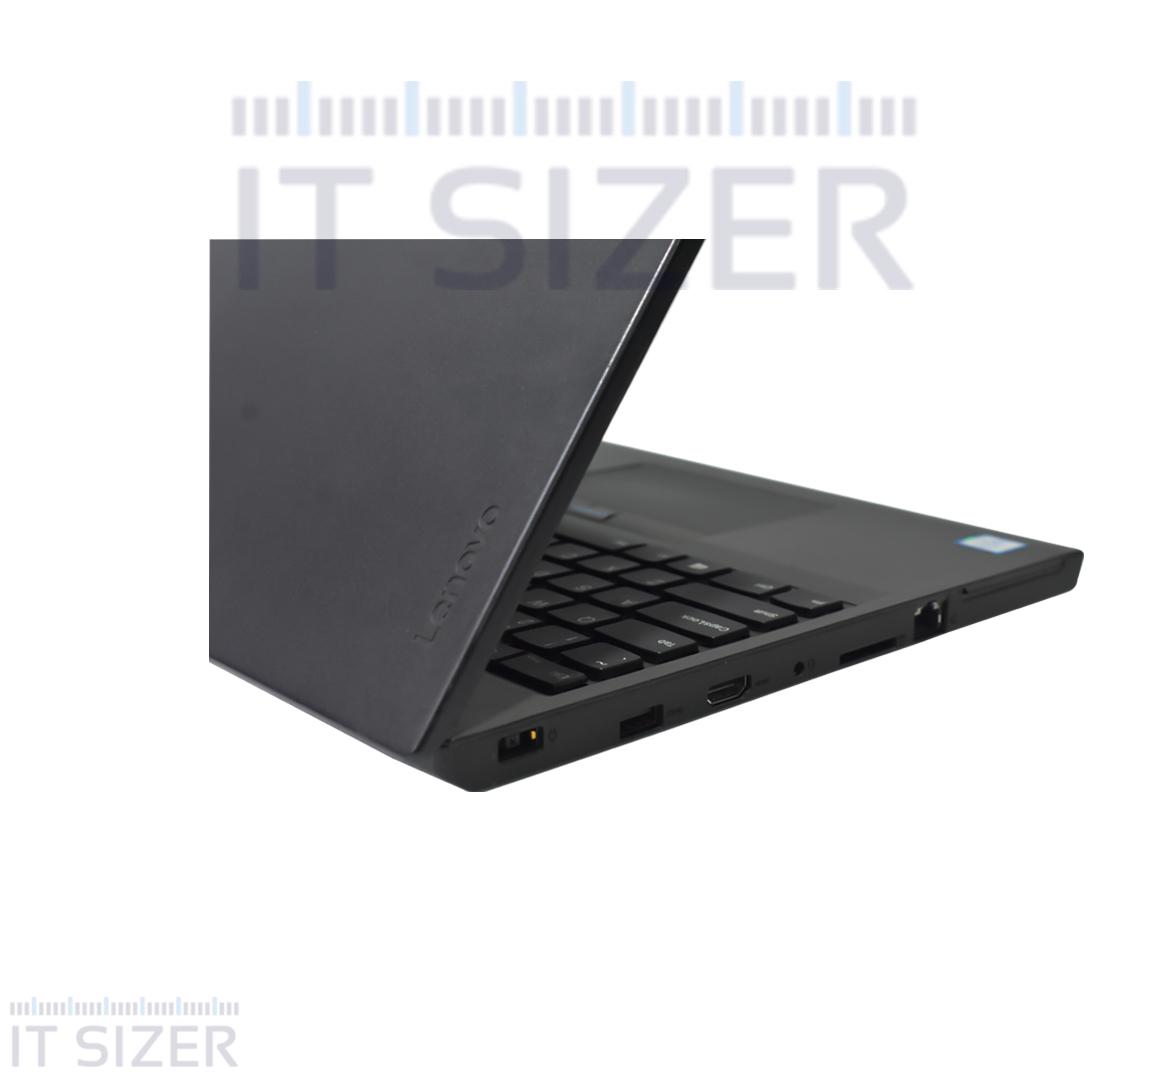 Lenovo T560 Business Laptop, Intel Core i5 CPU, 8GB DDR3L SODIMM RAM, 256GB SSD 2.5, 15 inch Display, Windows 10 pro (Renewed)